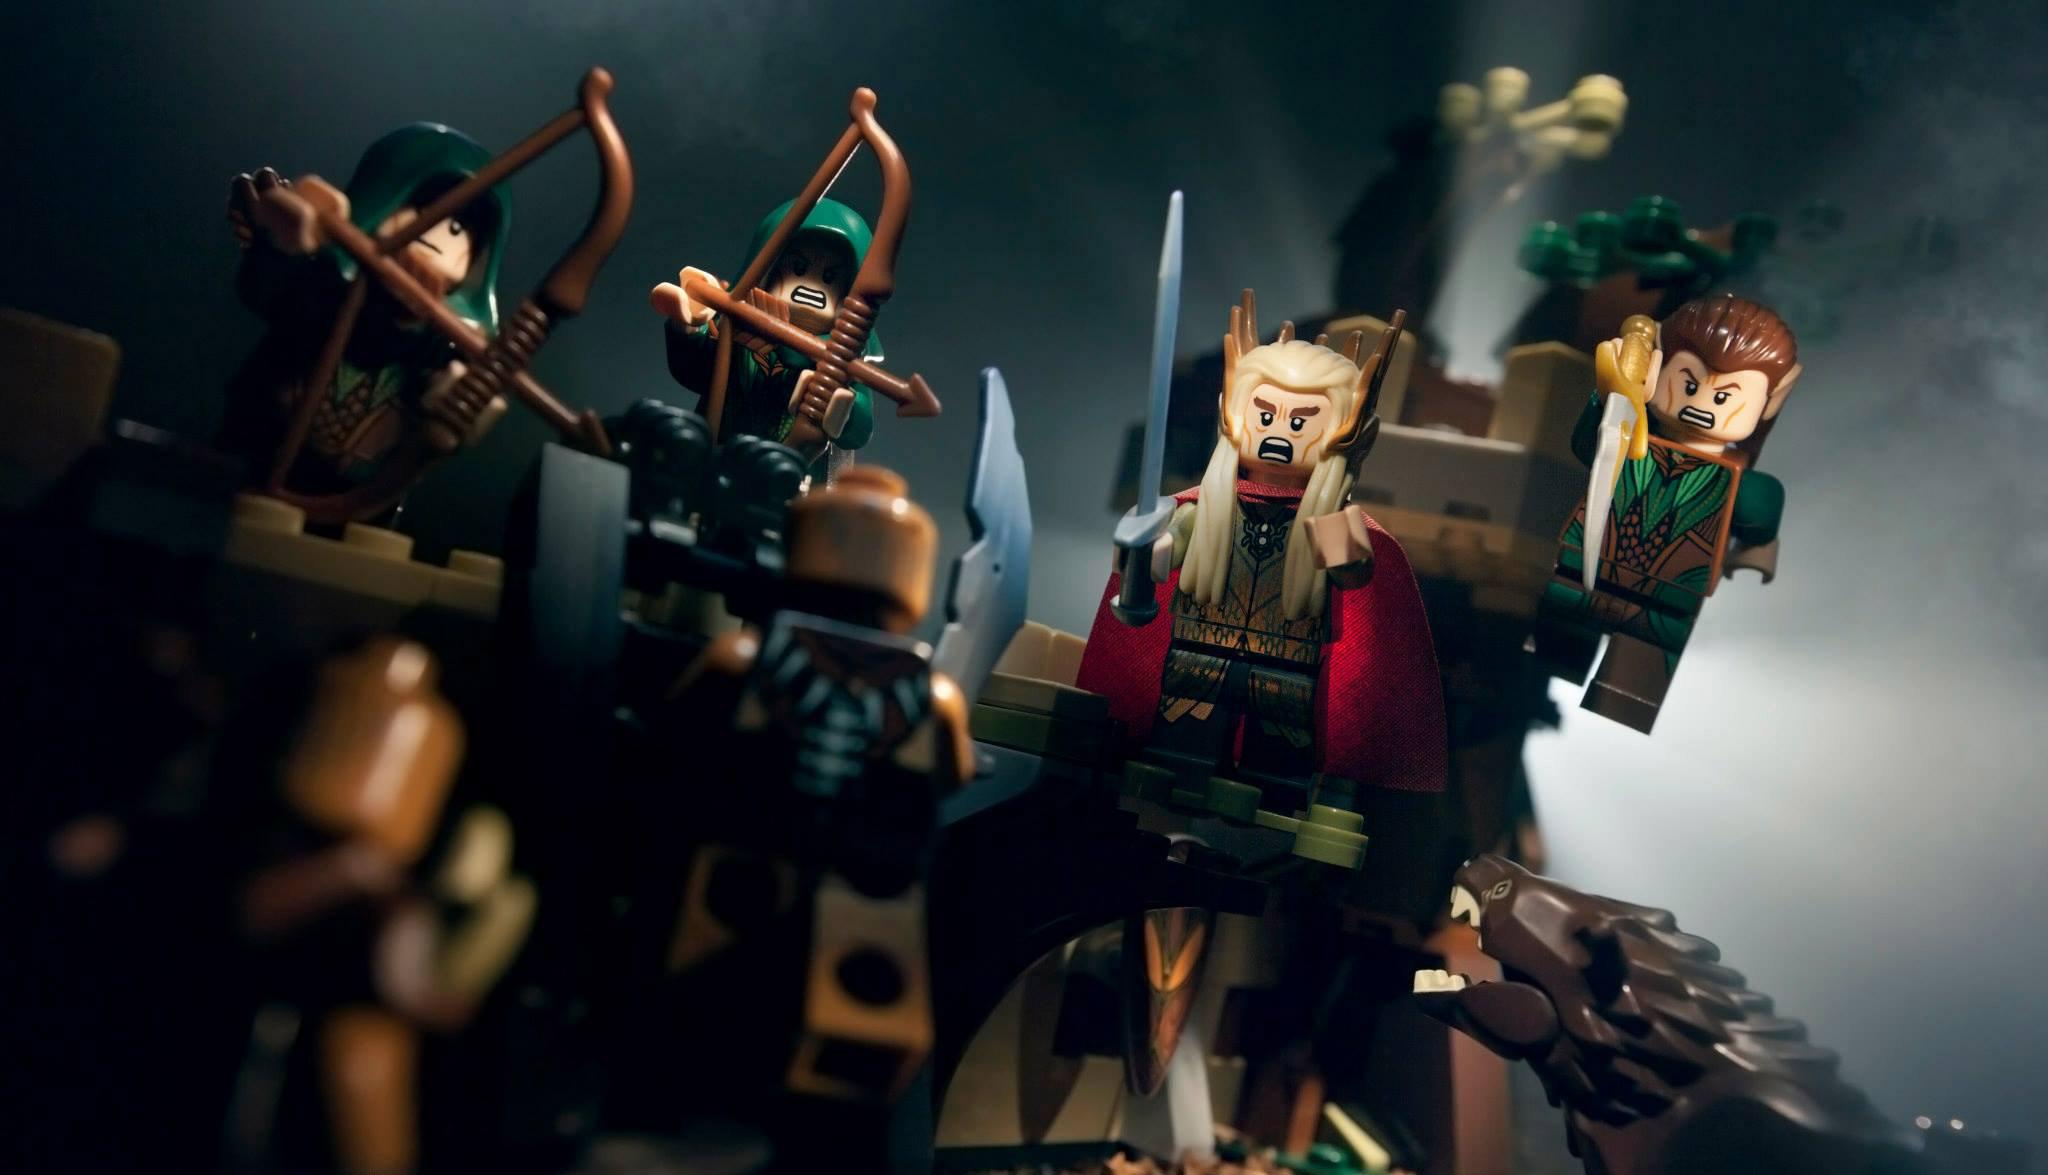 vesa-lehtimaki-hobbit-mirkwood-elf-army